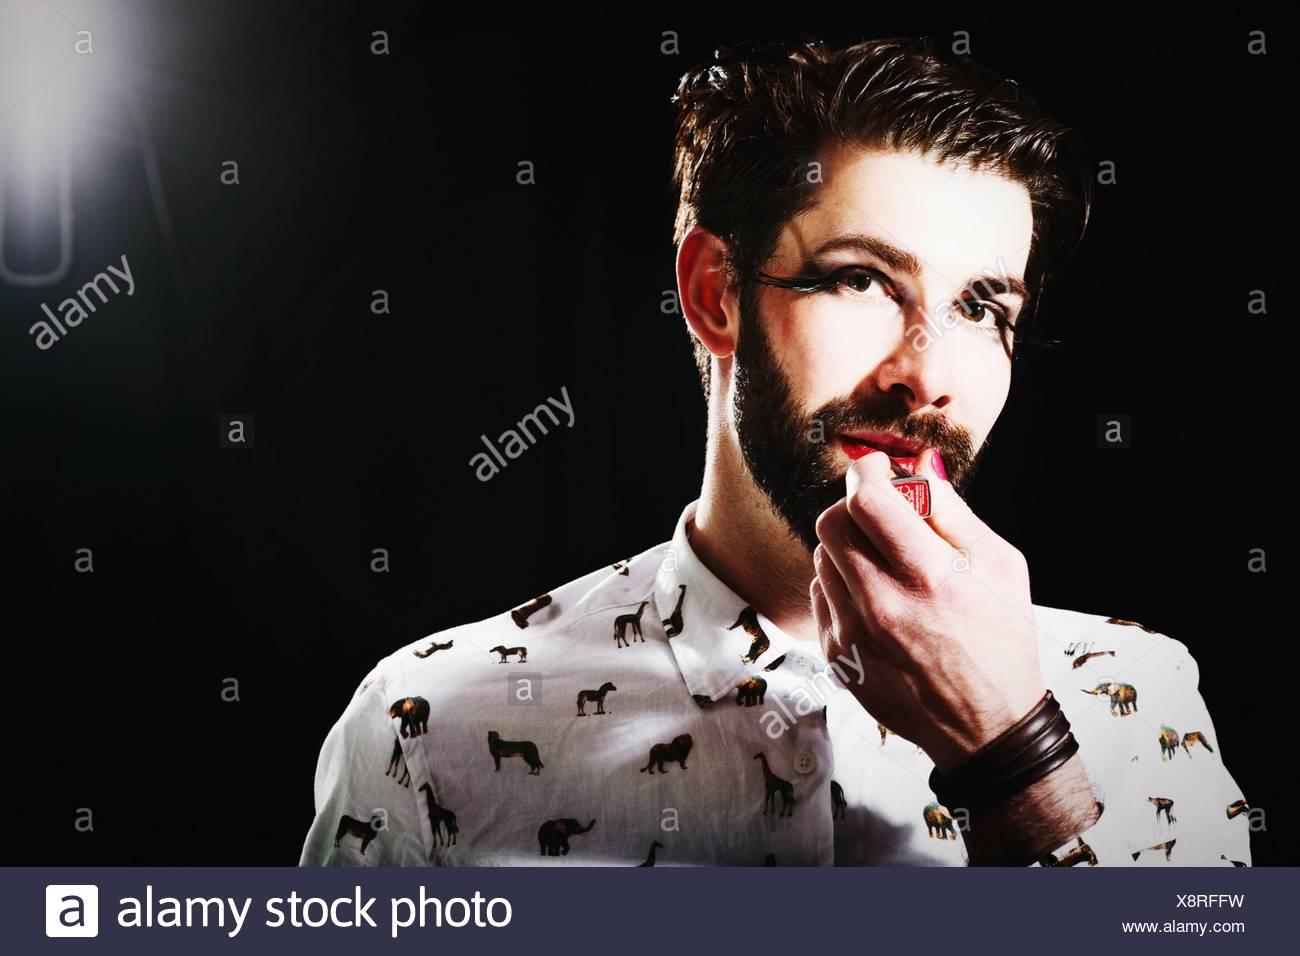 Portrait Of Man Applying Lipstick Standing Against Black Background - Stock Image